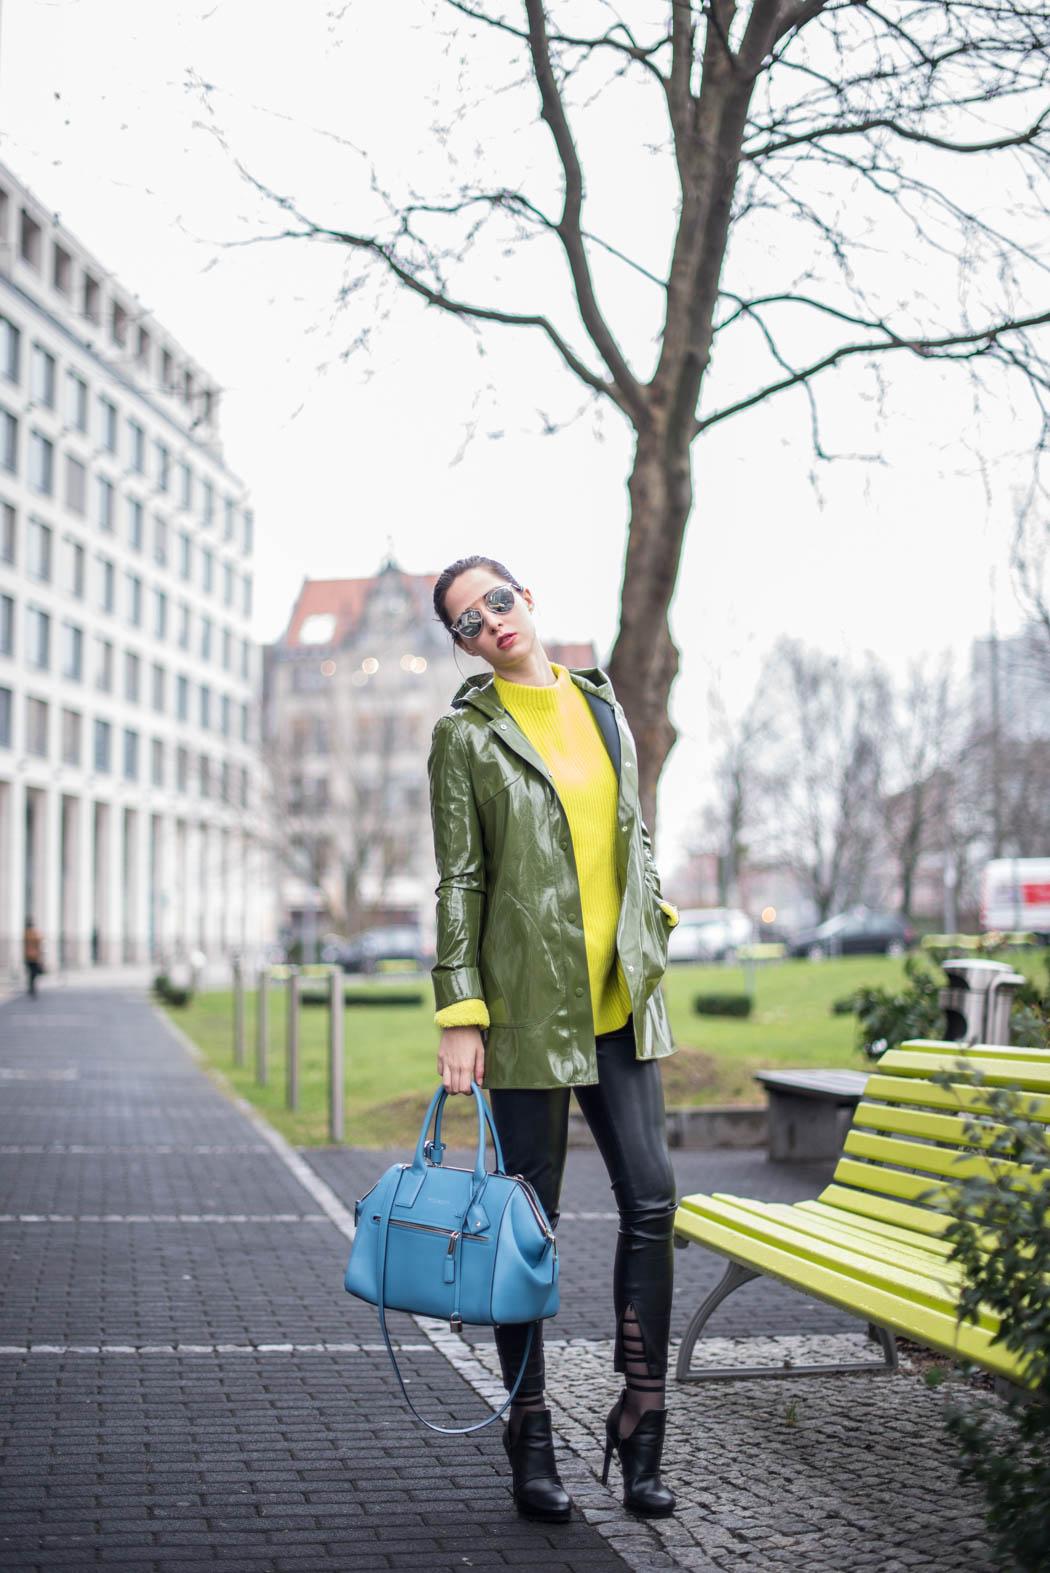 Marc-Jacobs-Sky-Incognito-Tasche-Regenmantel-Fashionblogger-München-Deutschland-Lindarella-Dior-So-Real-Berlin-1